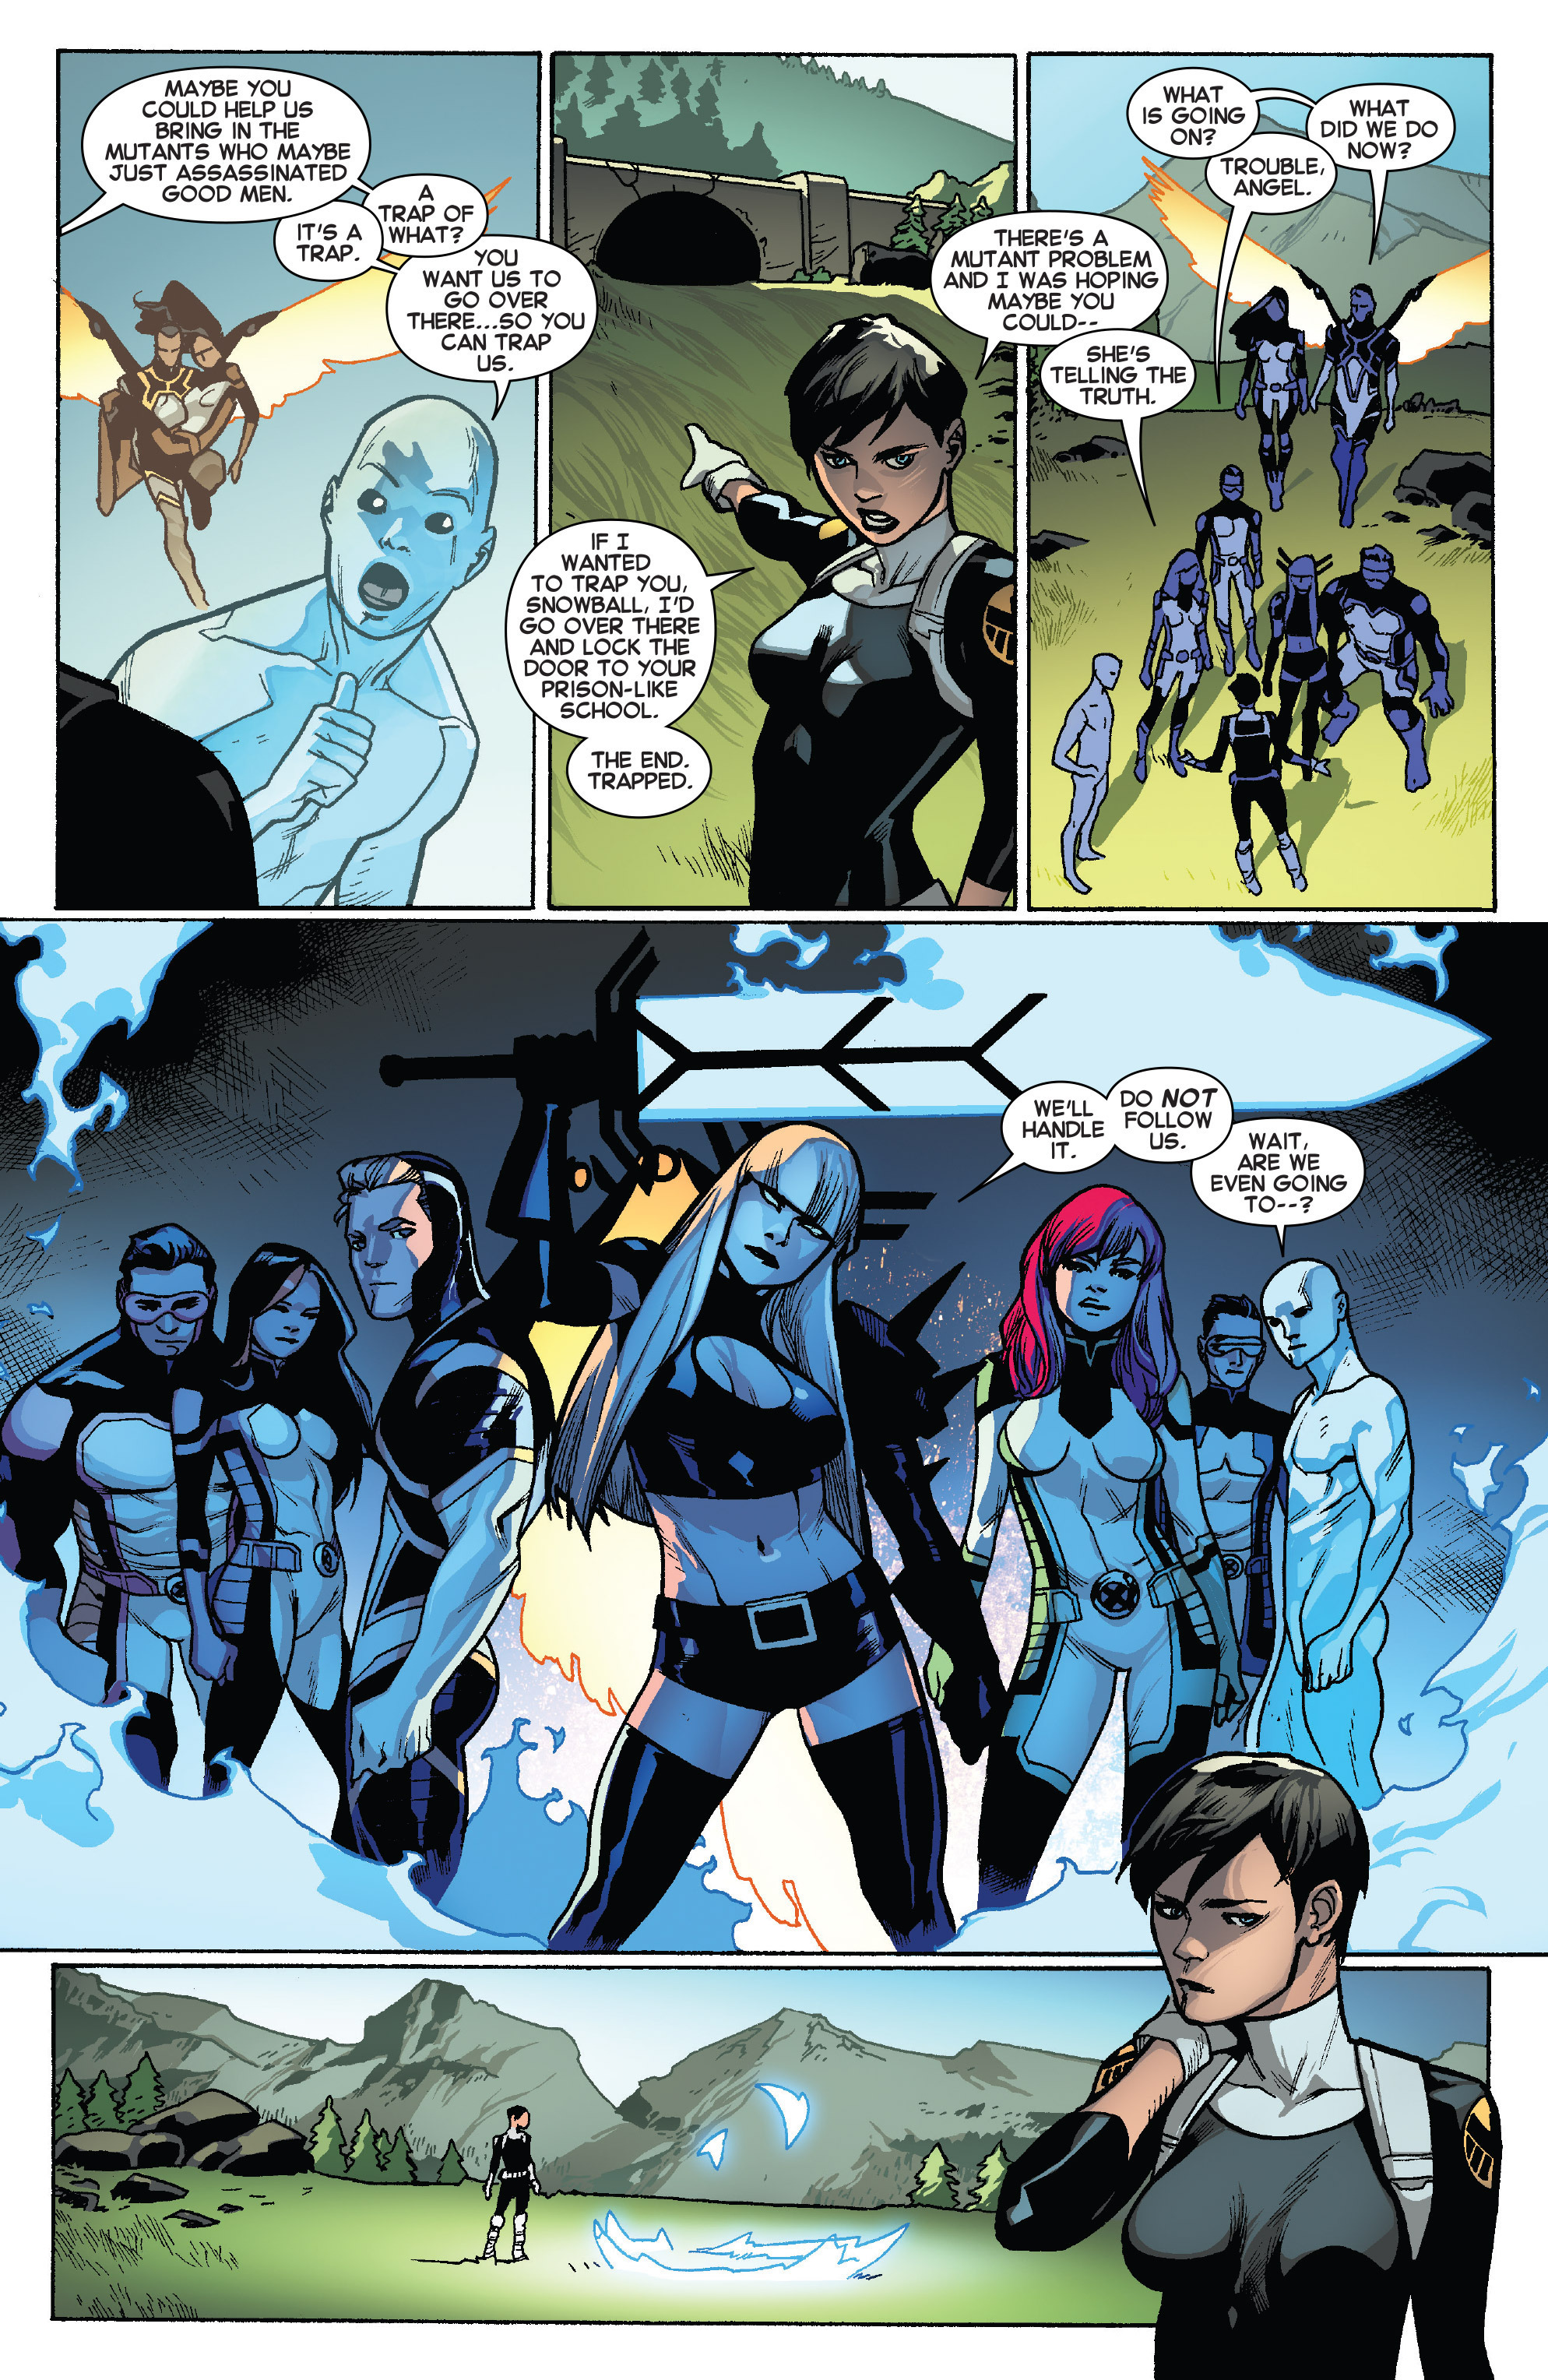 All-New X-Men (2013) chap 41 pic 7